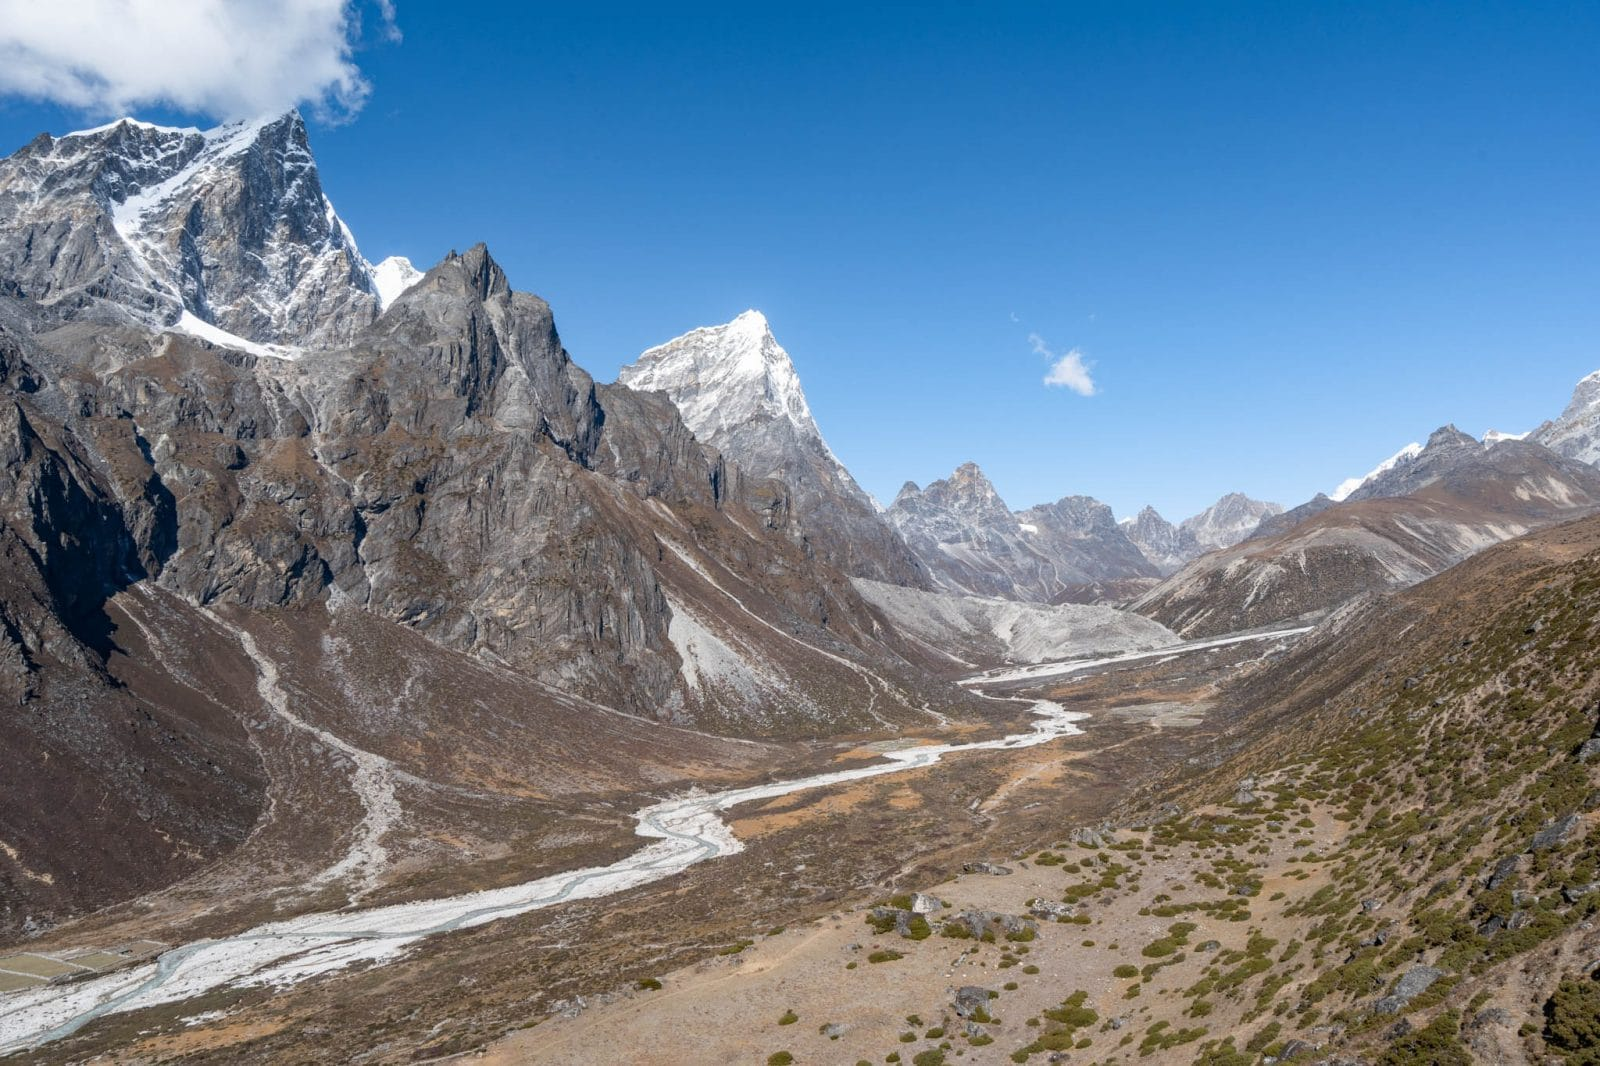 Views of Everest base camp trek